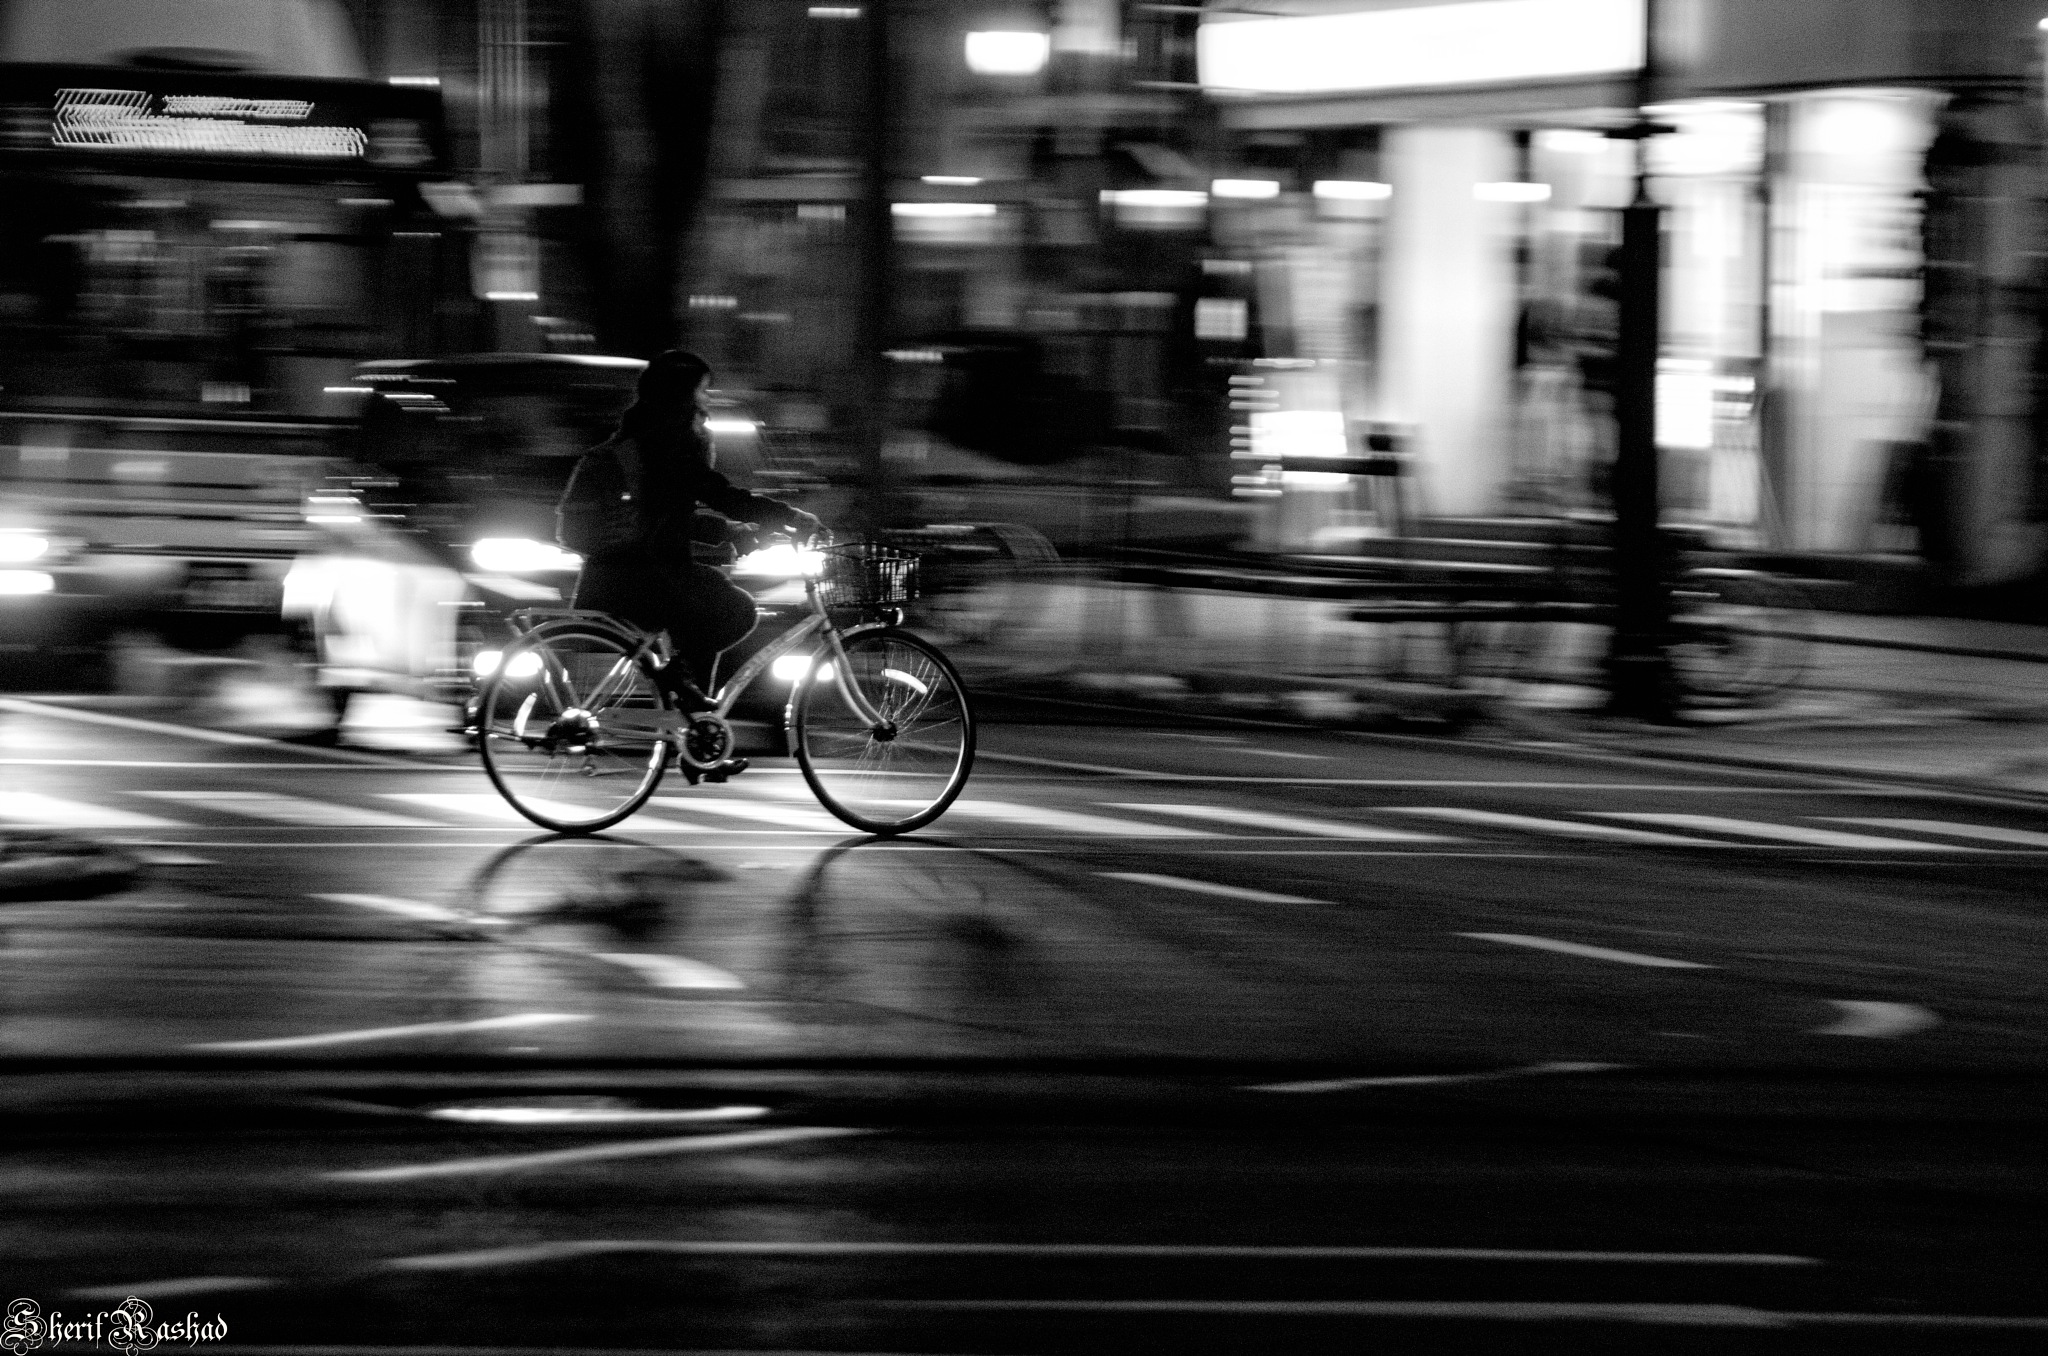 Late at night by Sherif Rashad